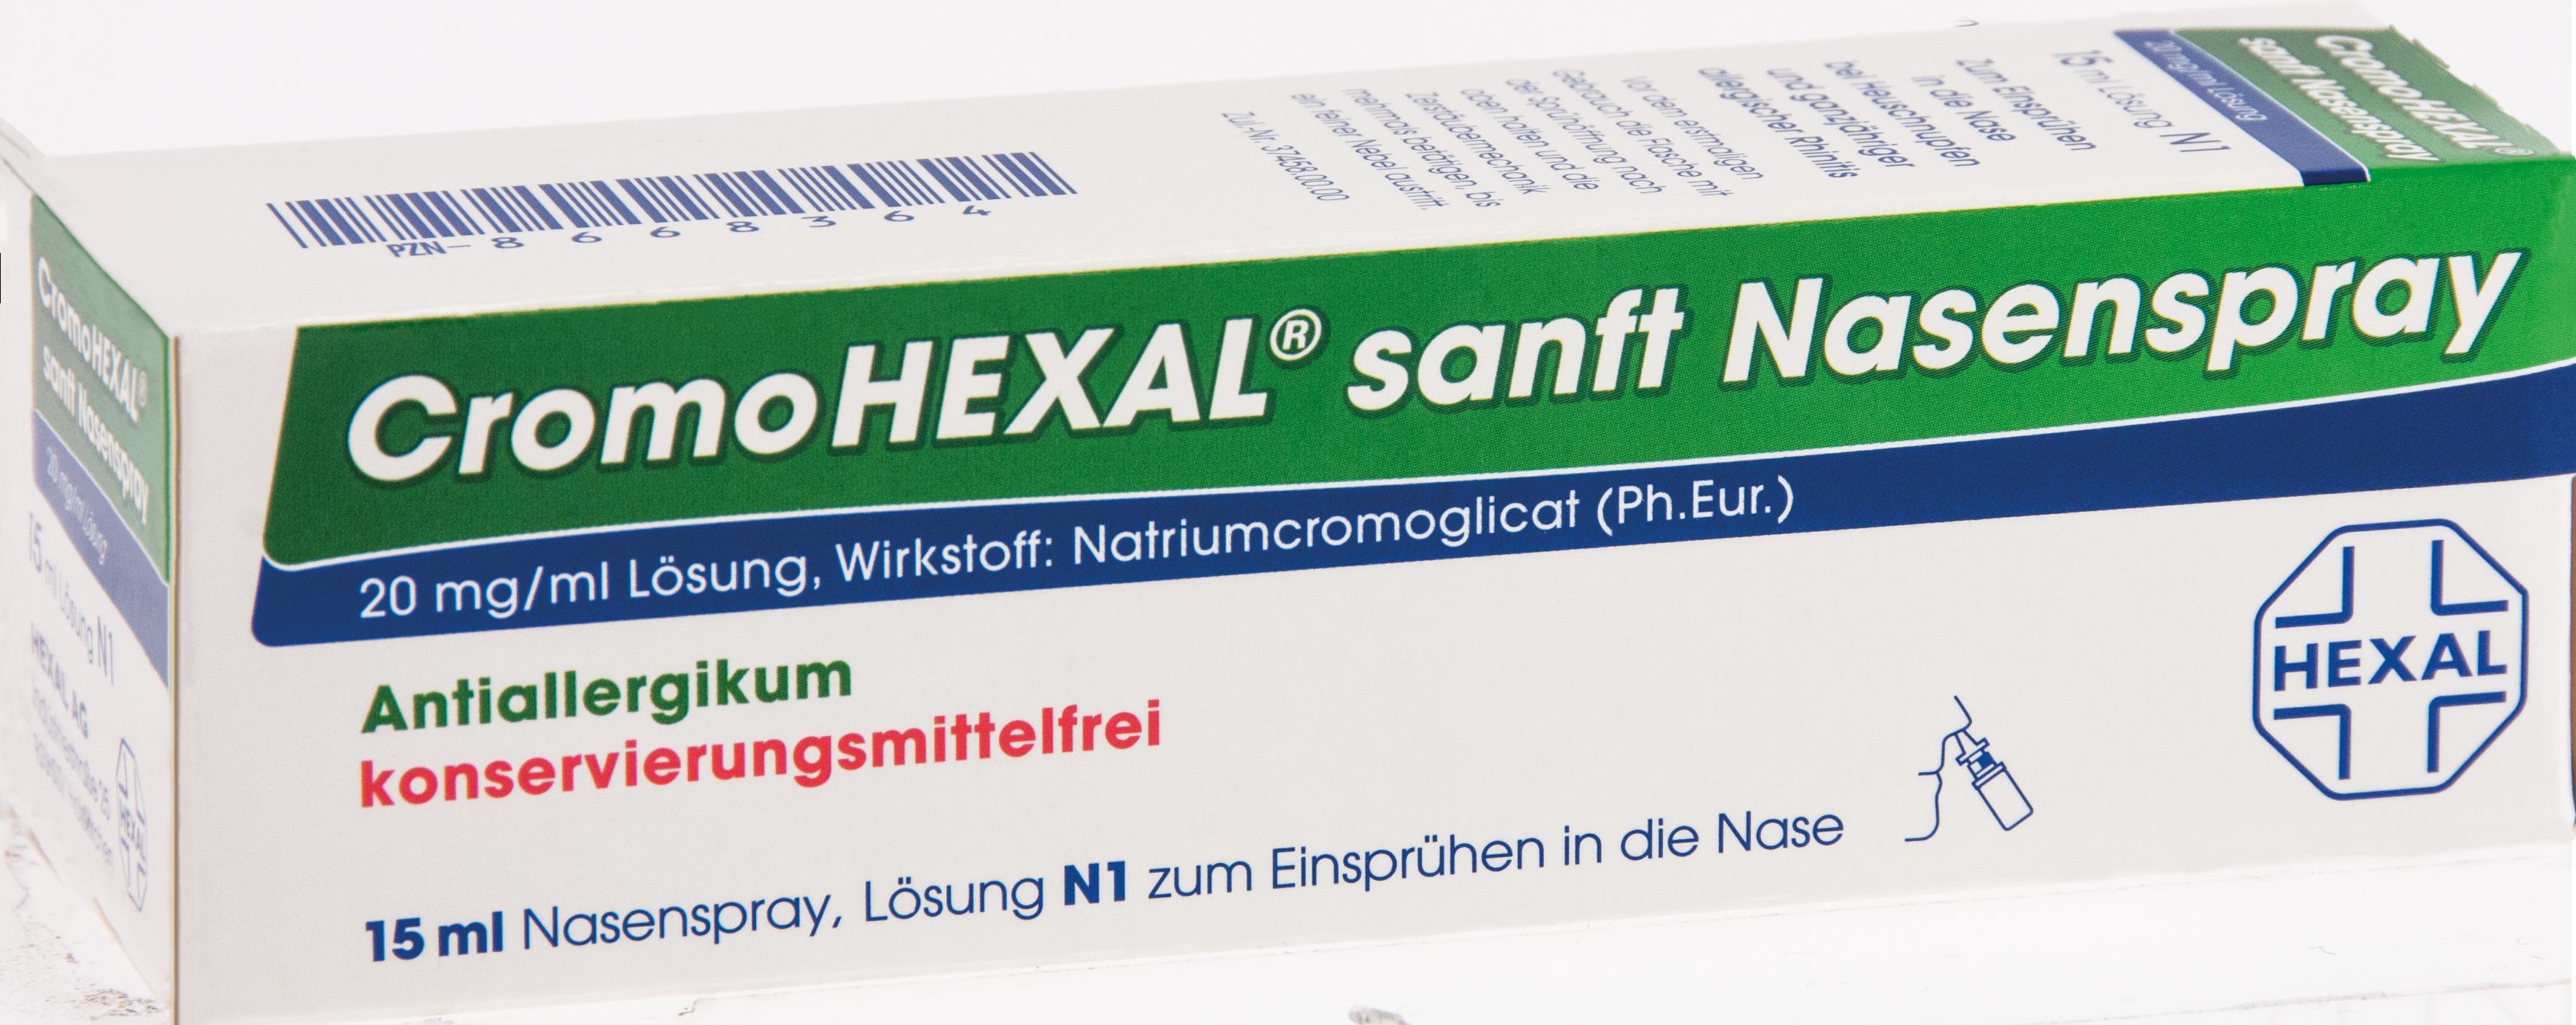 Cromohexal sanft